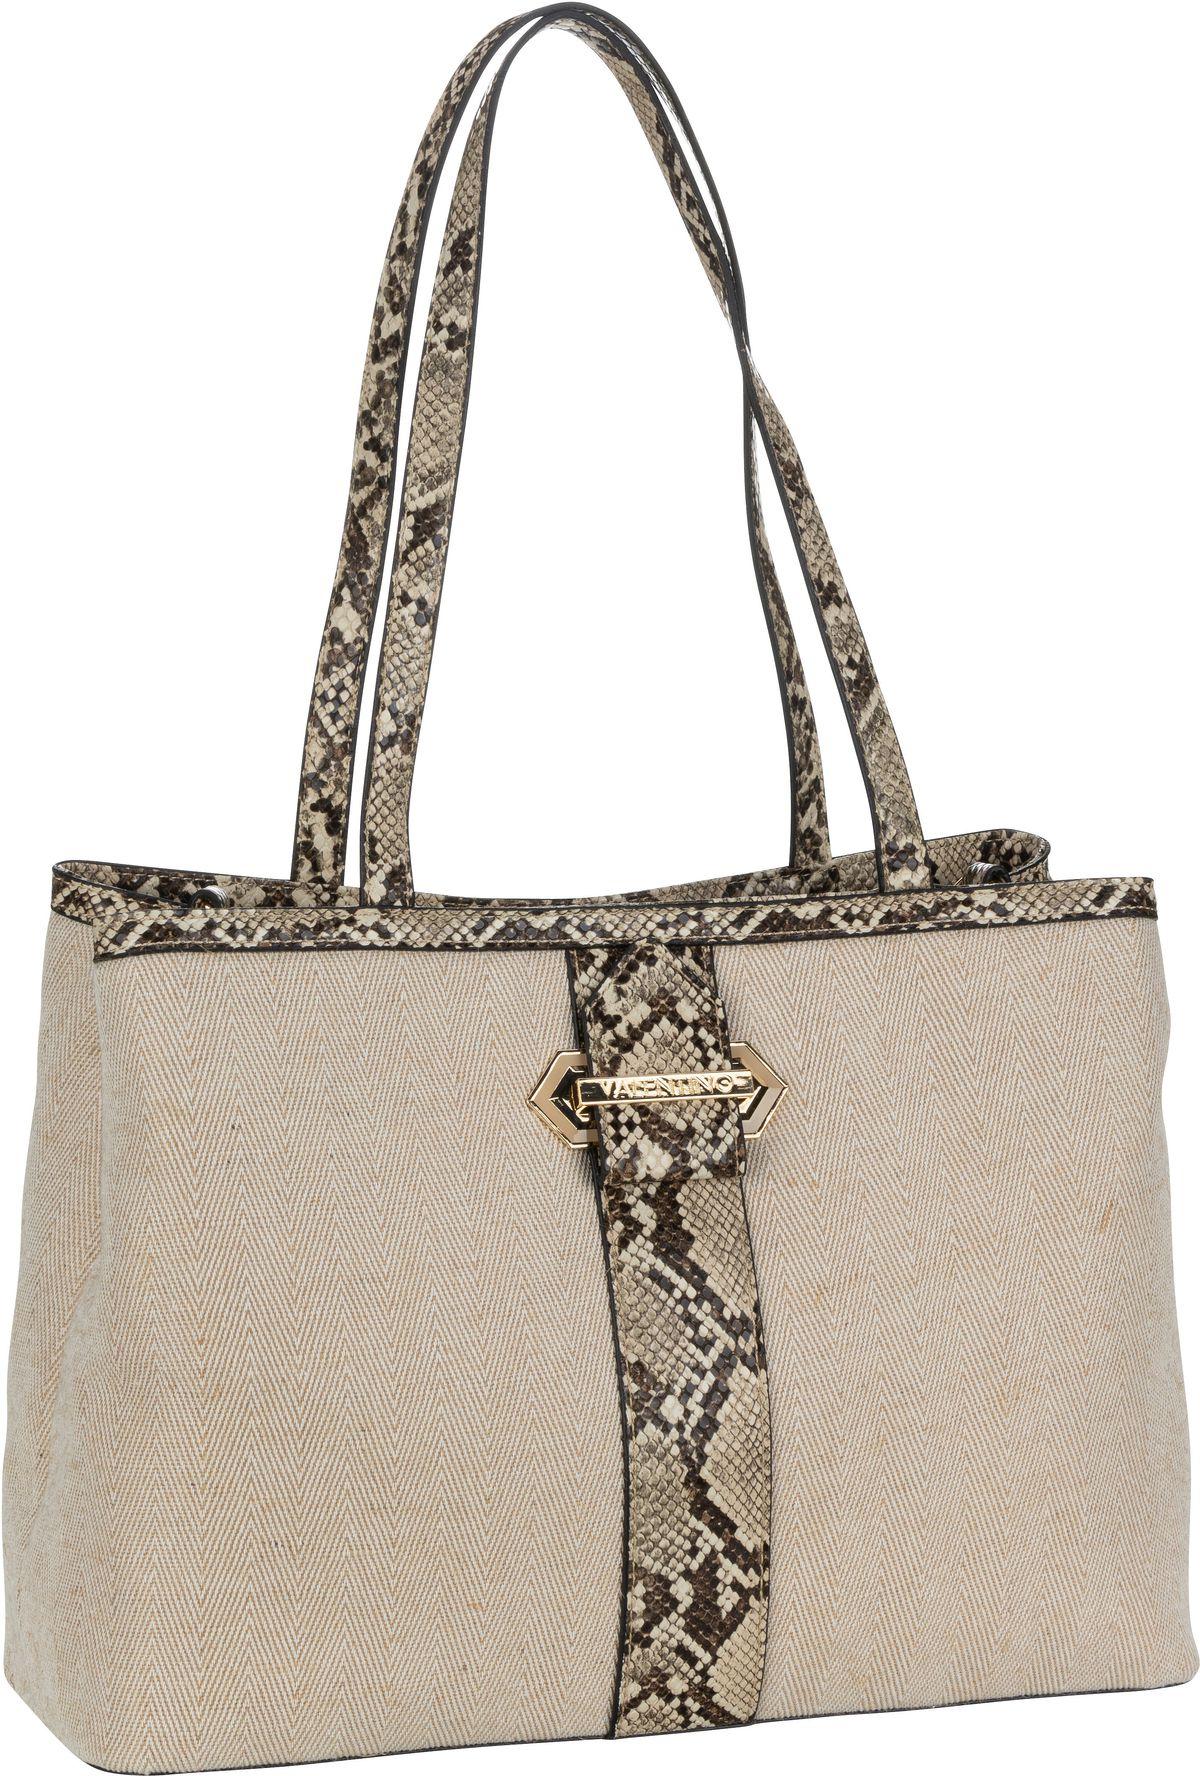 Bags Handtasche Gigante Shopping P01 Natur/Beige